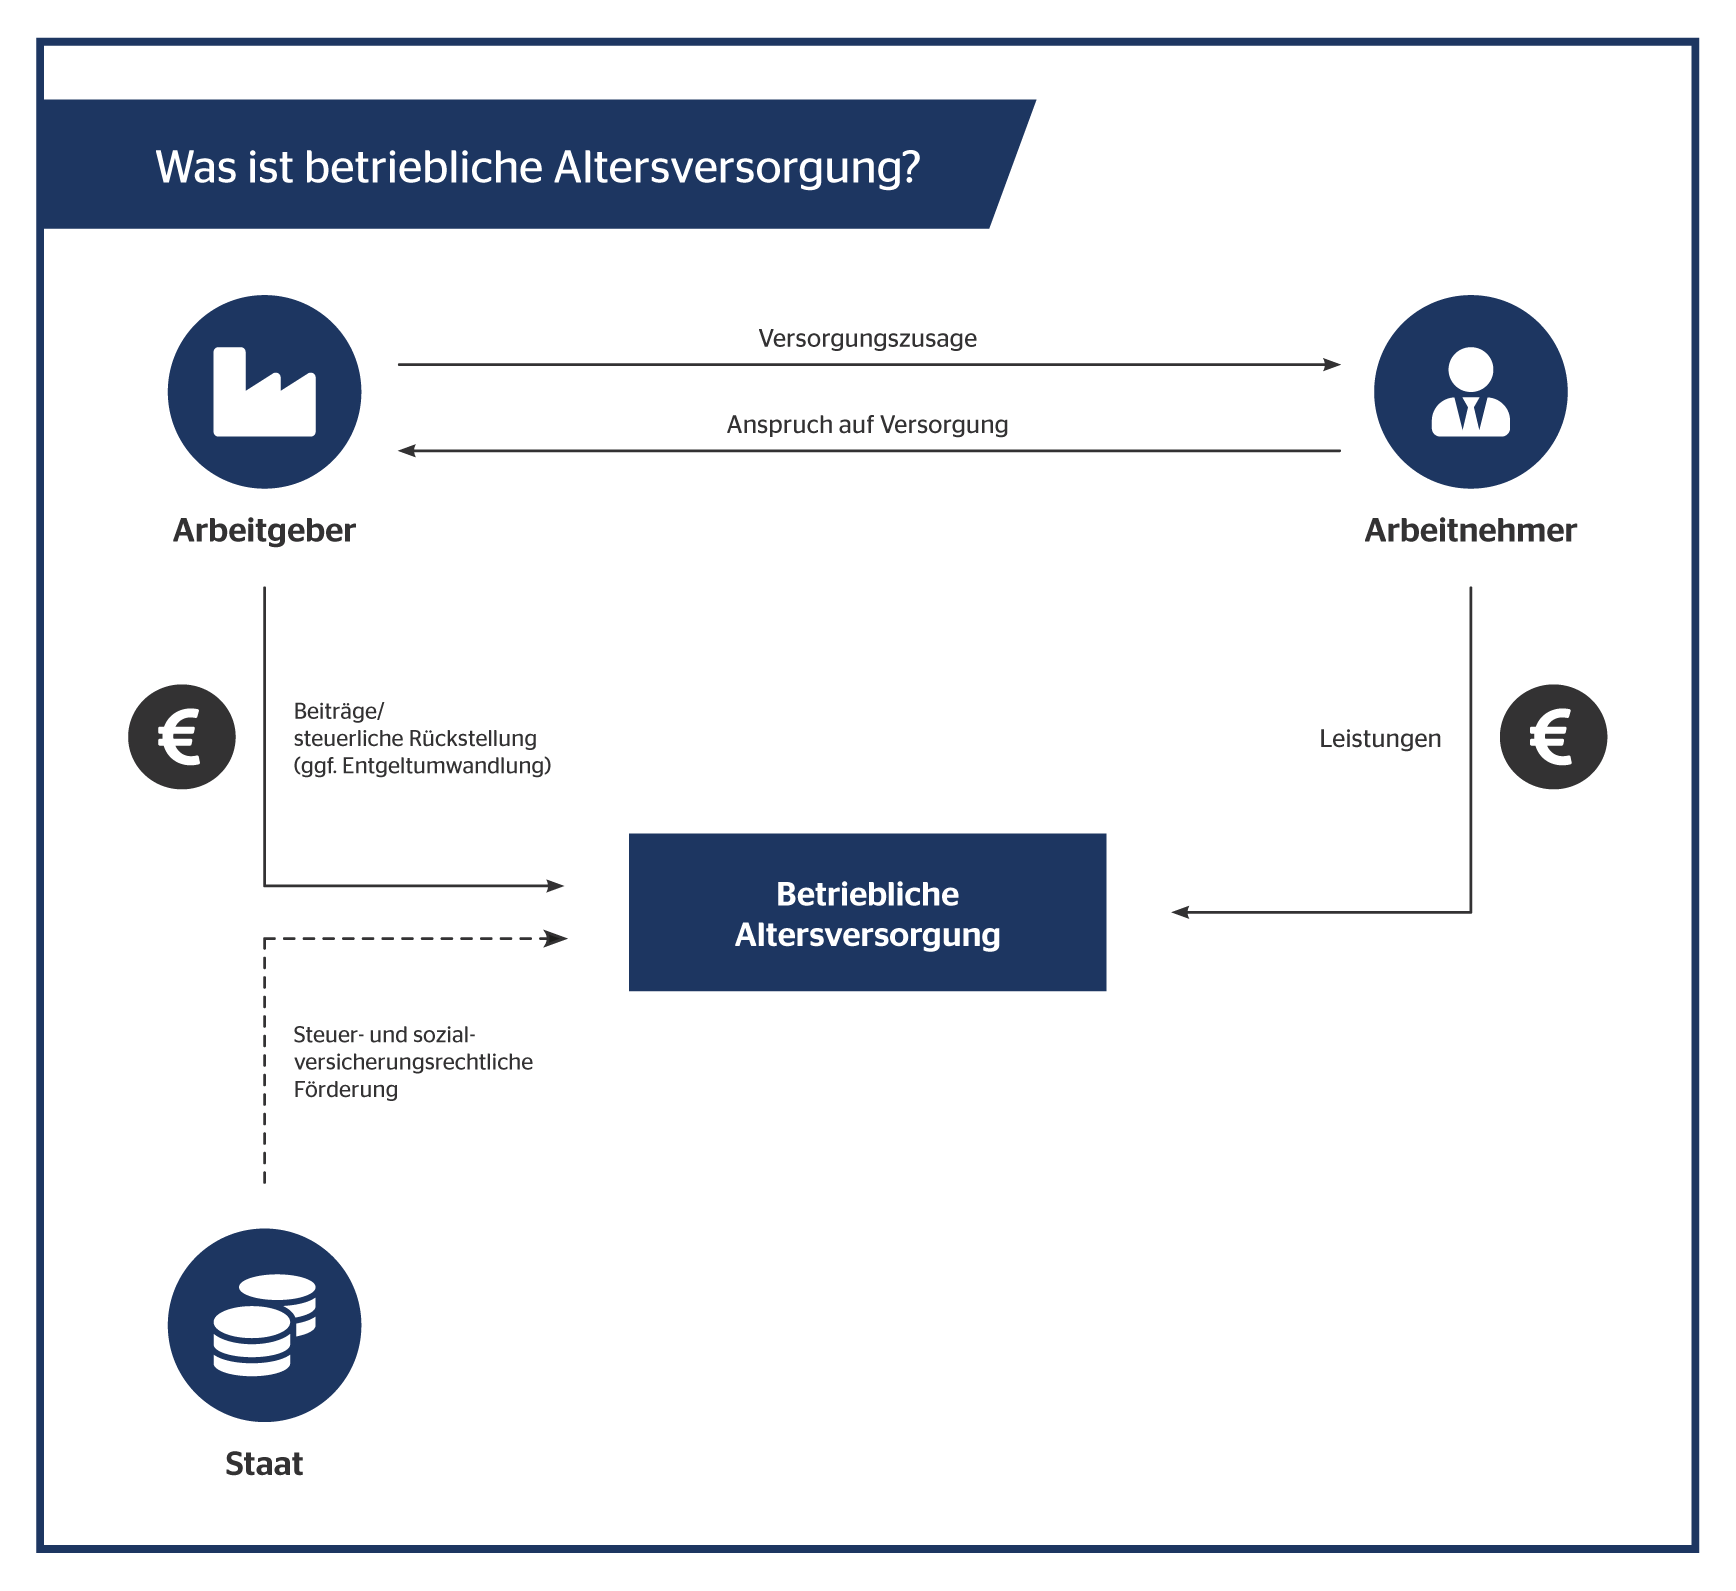 Infografik • Betriebliche Altersvorsorge Paderborn • BAV • OVB Daniel Uhlmannsiek • Altersvorsorge Paderborn